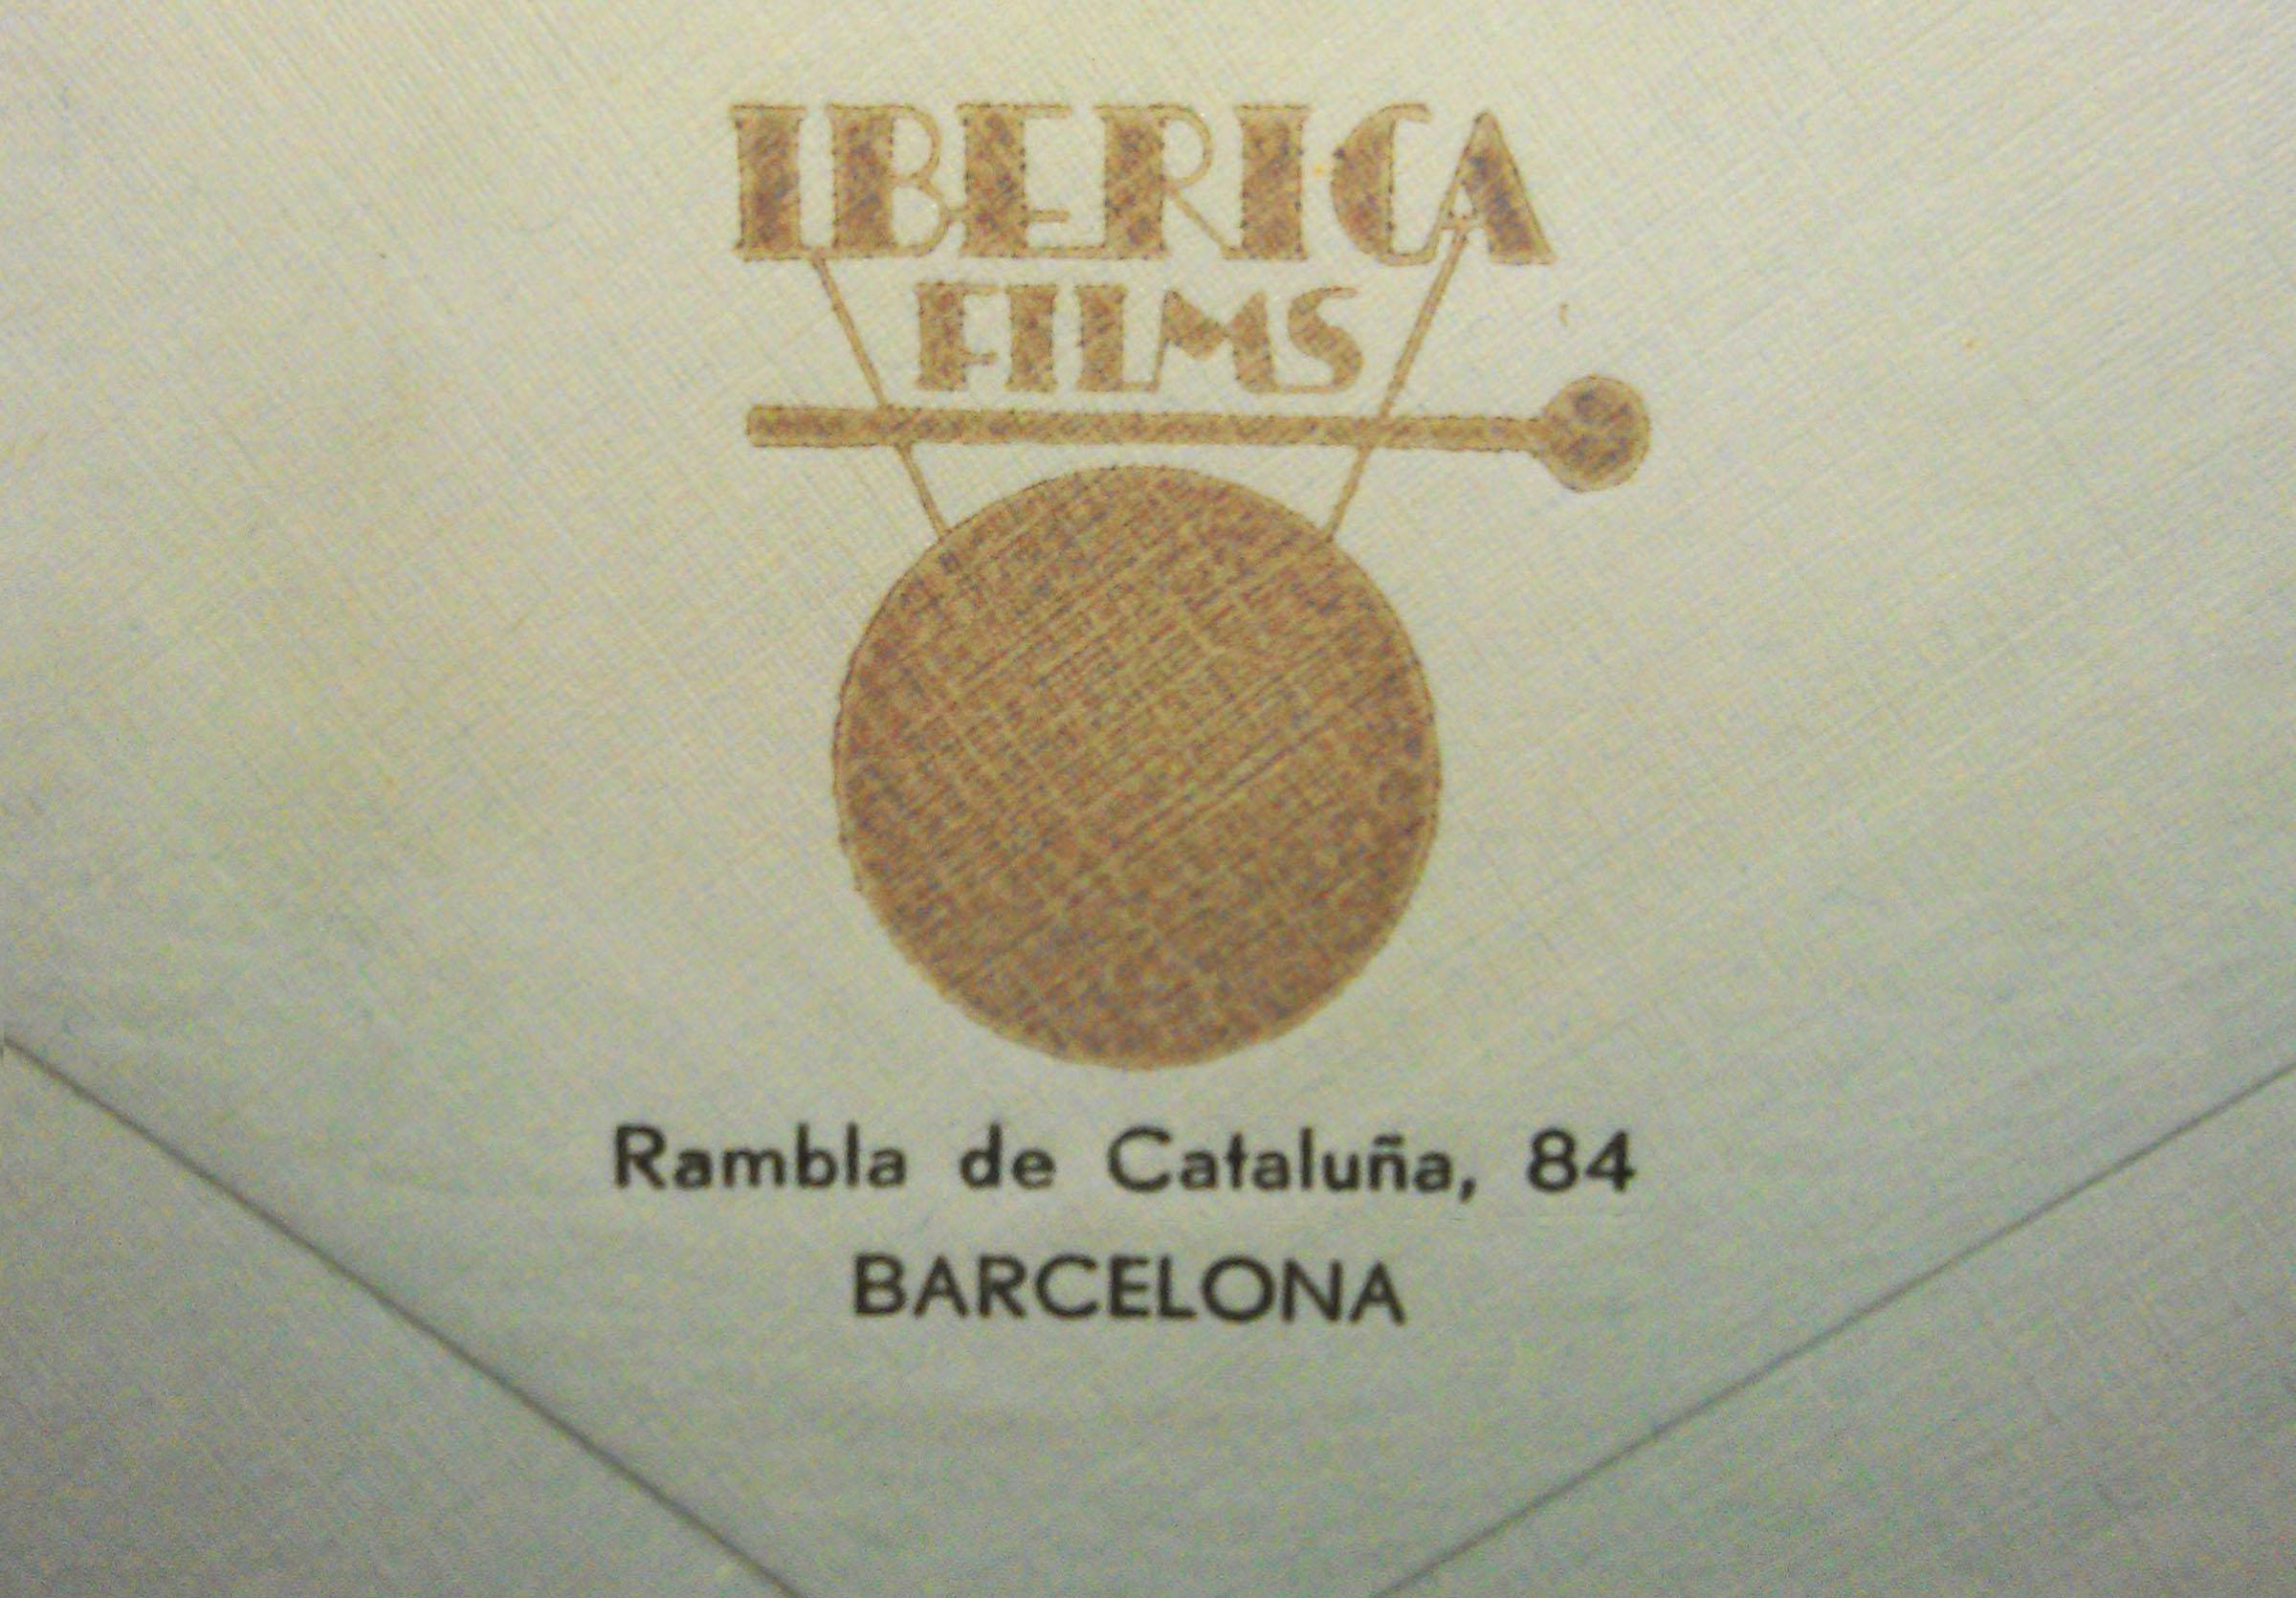 Segell d'Ibérica Films. Arxiu Manu Valentin.